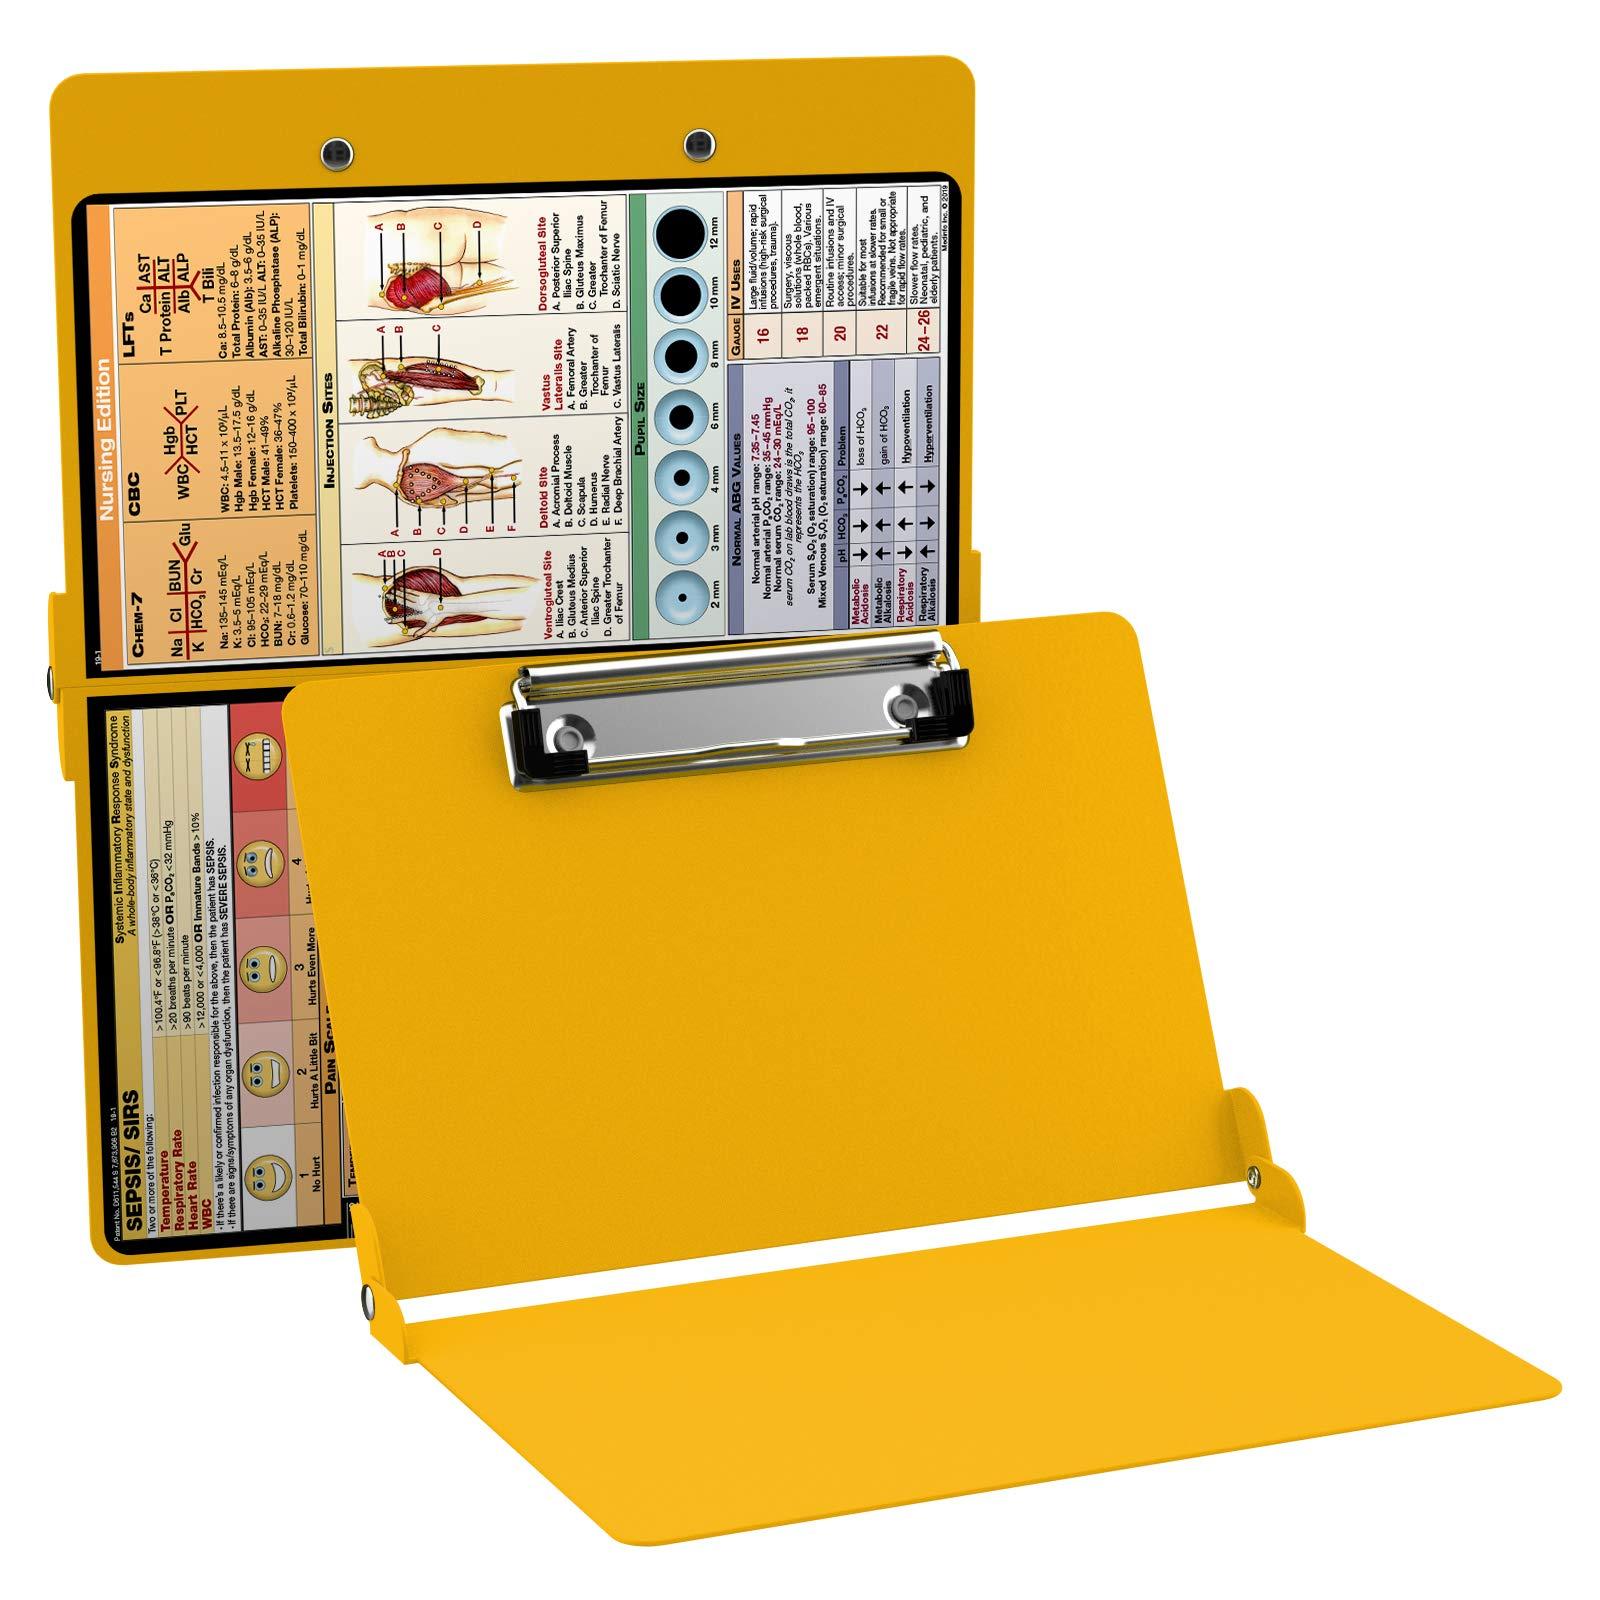 WhiteCoat Clipboard-Yellow Regal - Nursing Edition by WhiteCoat Clipboard